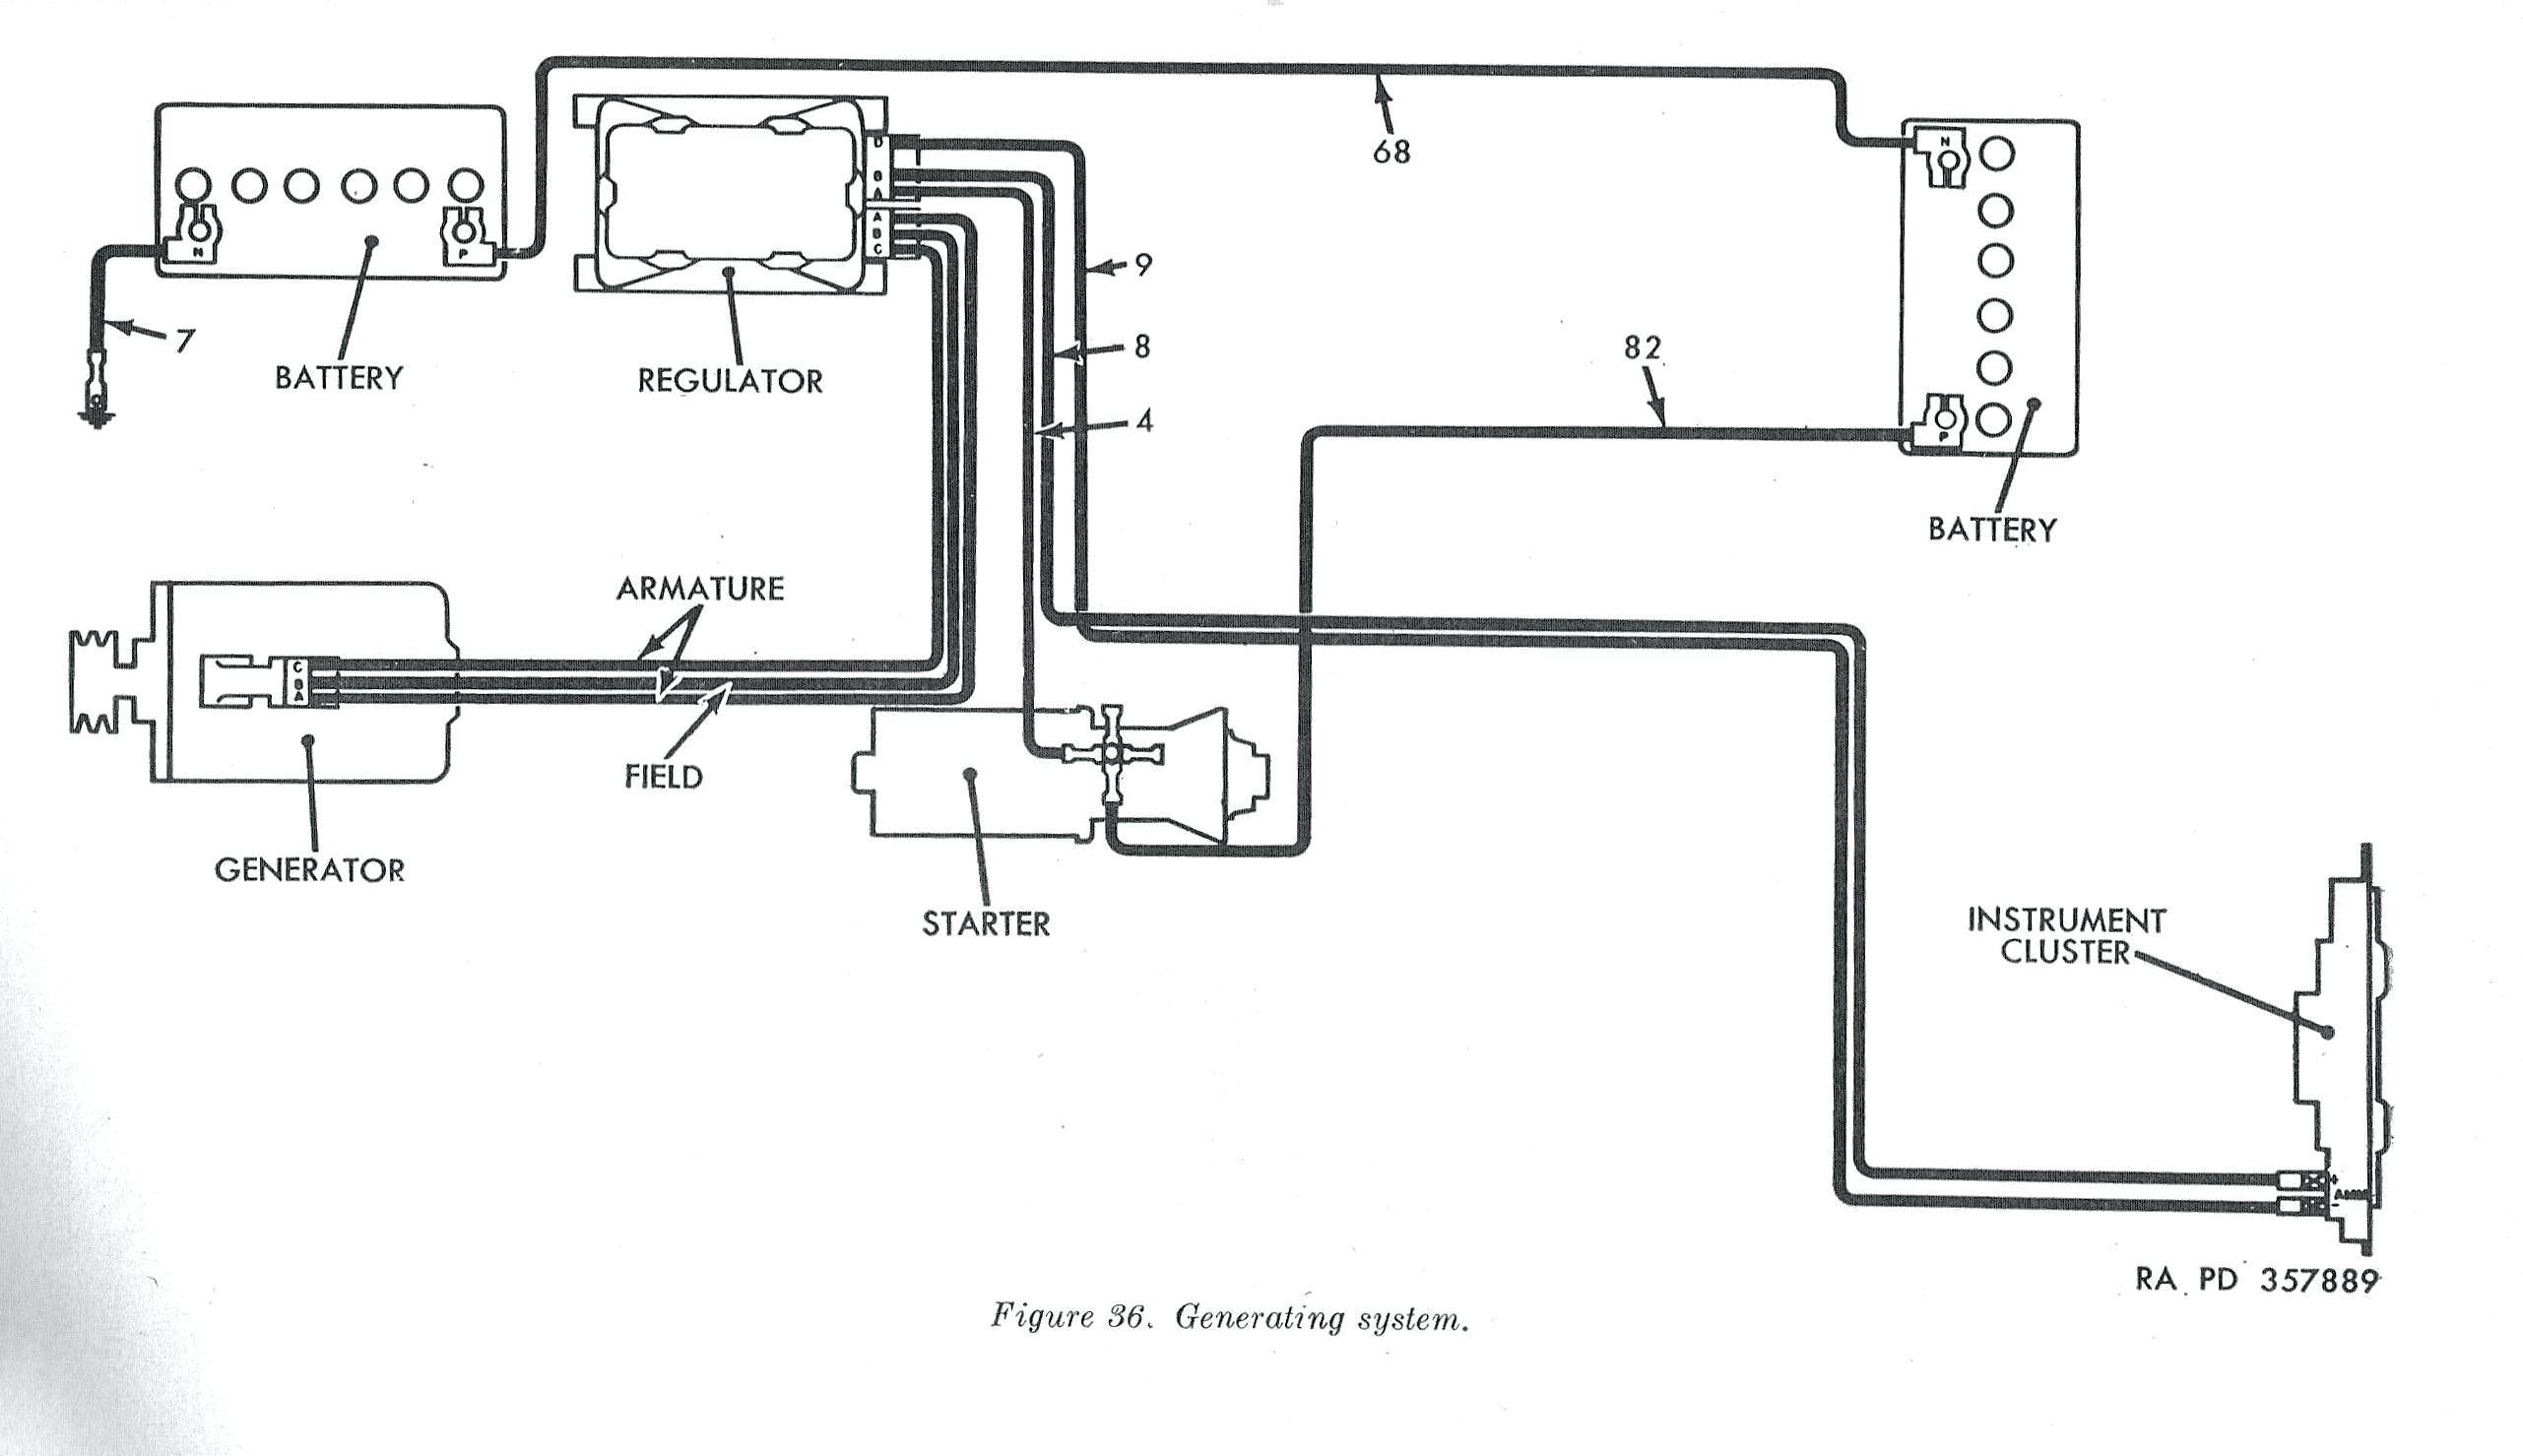 Manual Generator Transfer Switch Wiring Diagram Manual